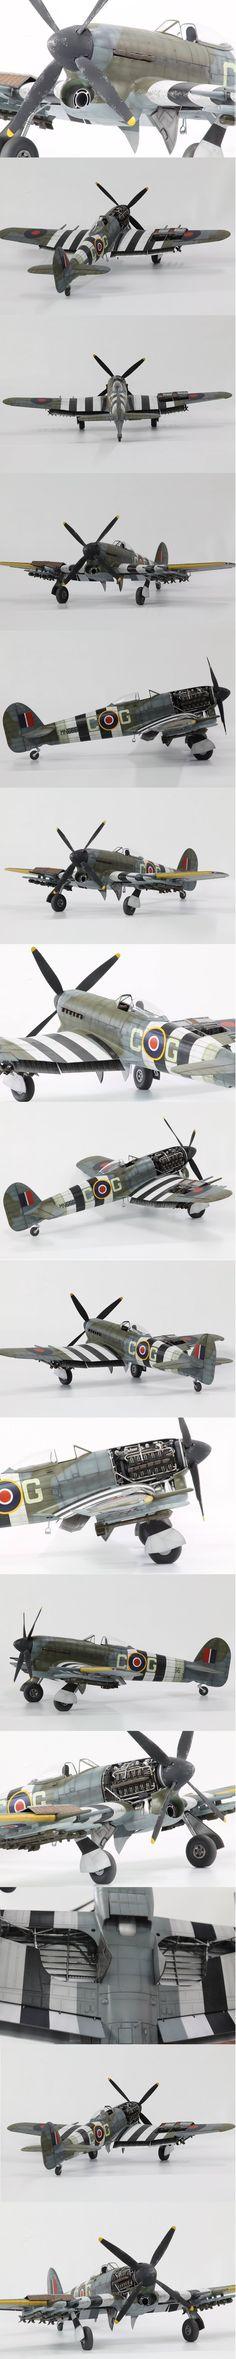 Hawker Tempest Mk.V 1/48 Scale Model